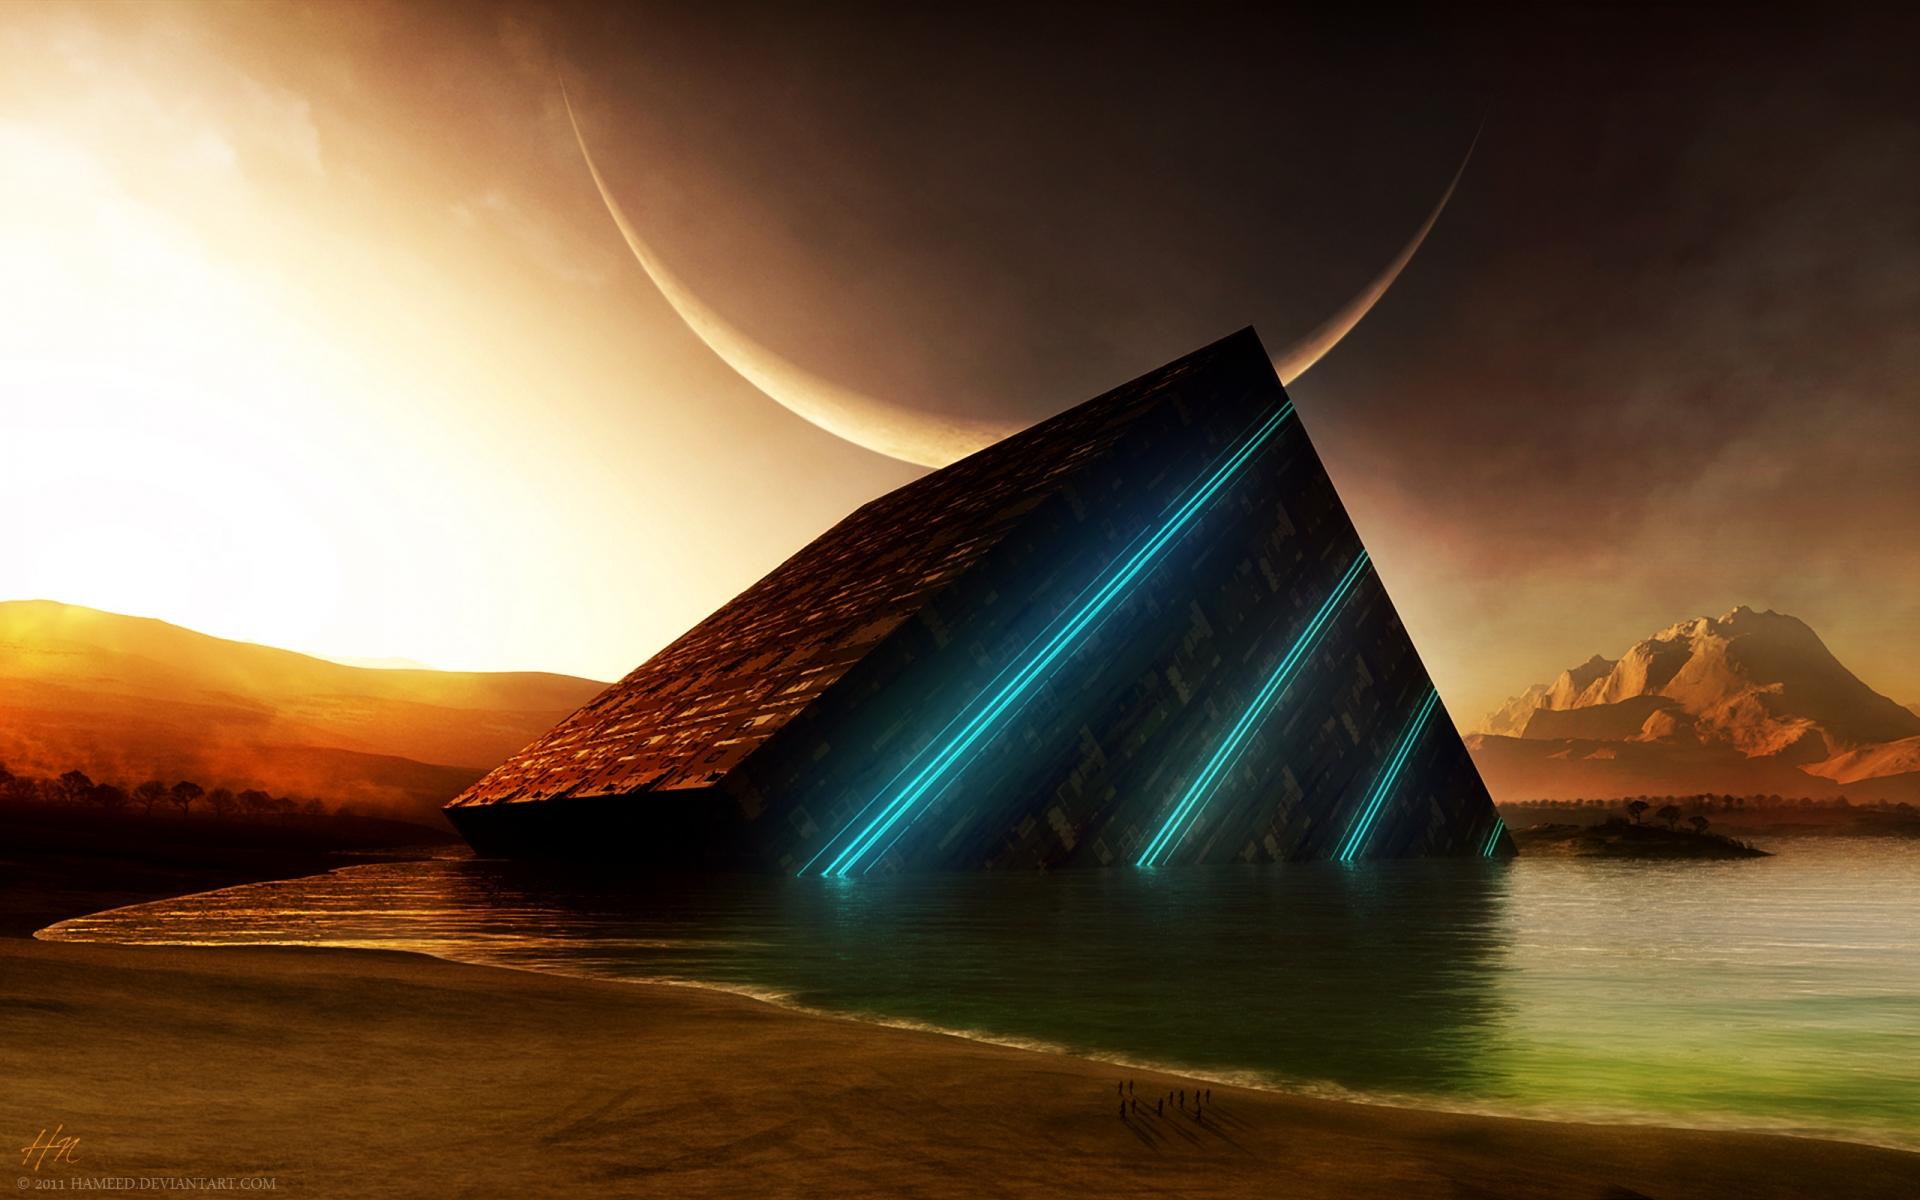 46 Pyramid Hd Wallpaper On Wallpapersafari